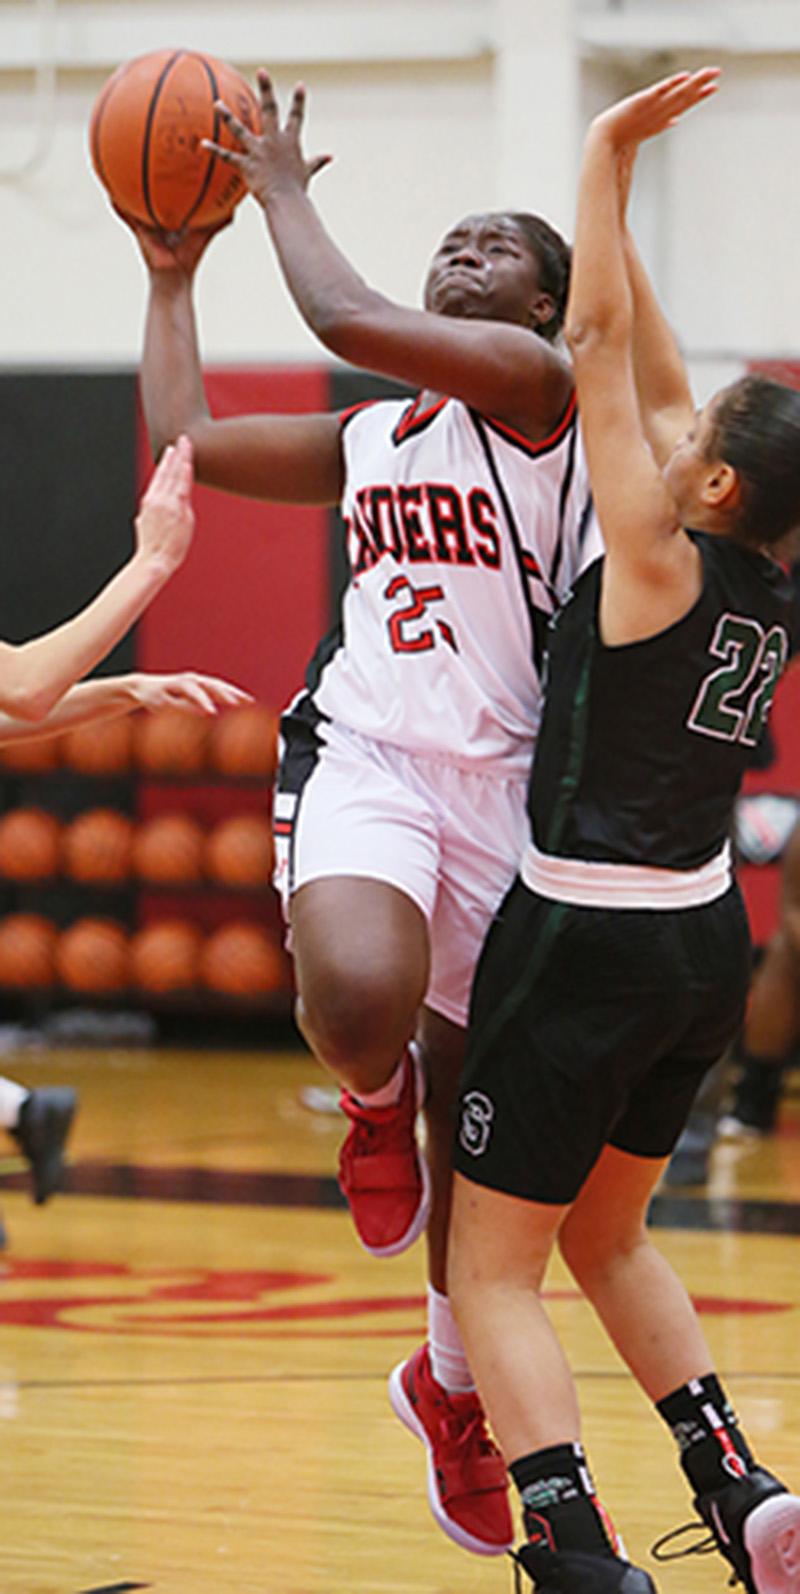 UP IN ARMS Hun School Girls Basketball Player Jada Jones Puts Up A Shot In Game Earlier This Season Last Saturday Senior Guard And Team Captain